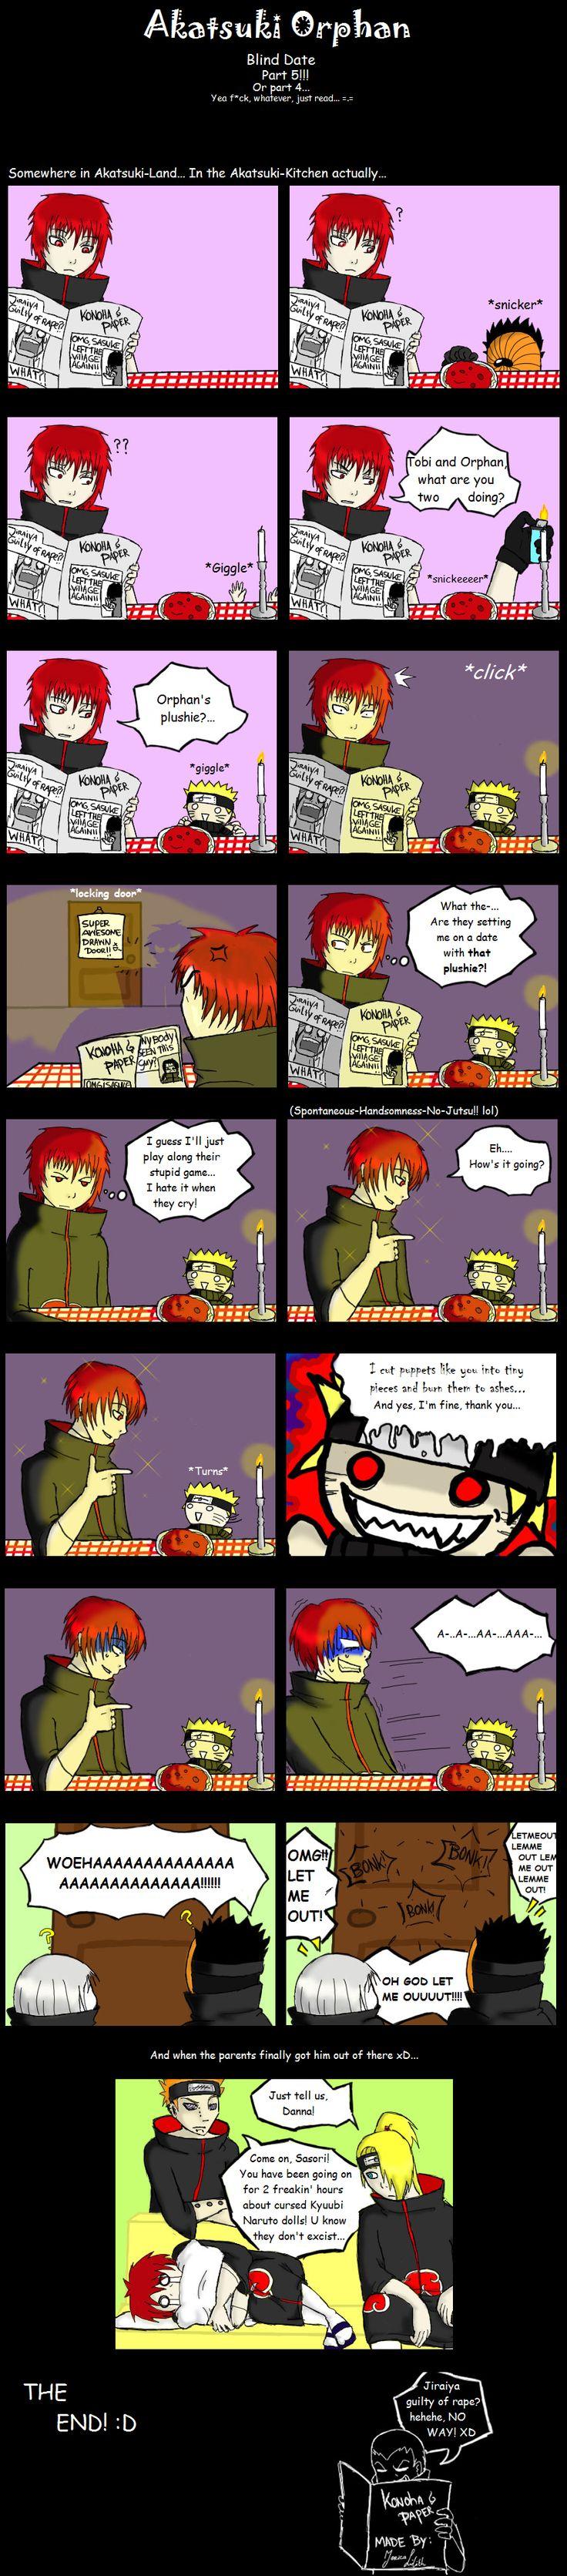 Akatsuki Orphan - Comic 5 by JericaLilith.deviantart.com on @DeviantArt